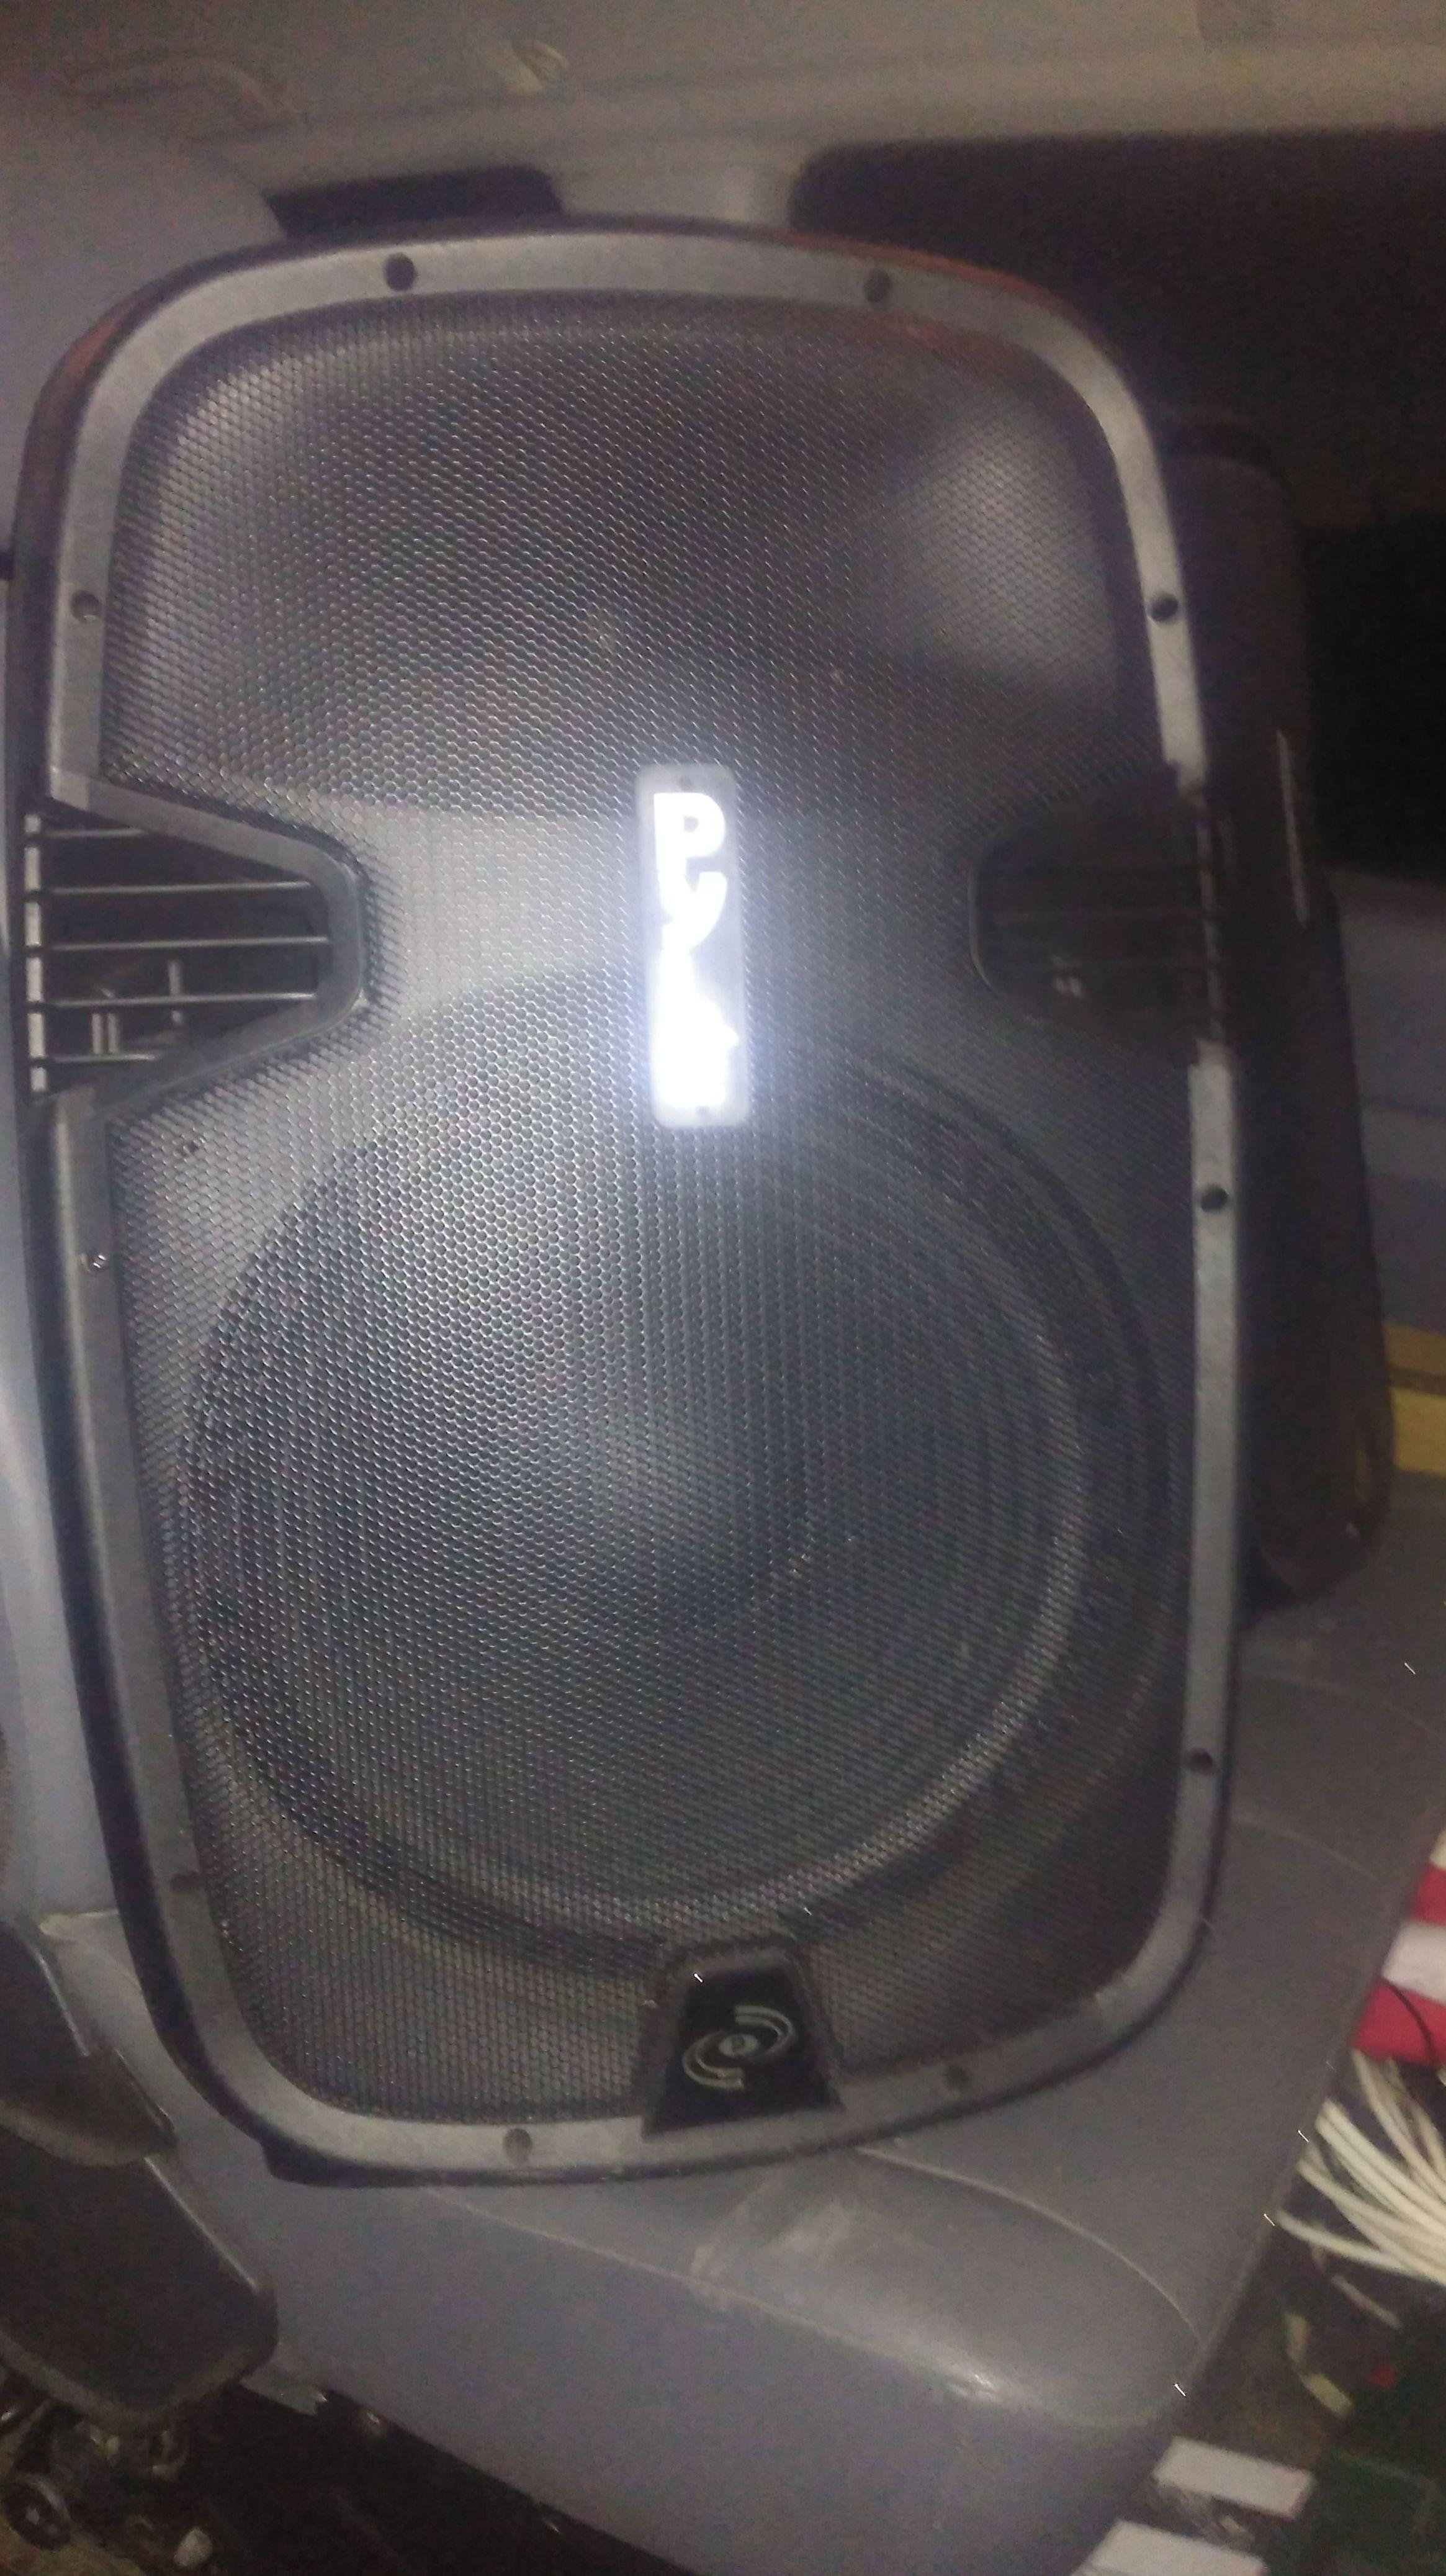 Altavoces auto amplificados USB bleutooth